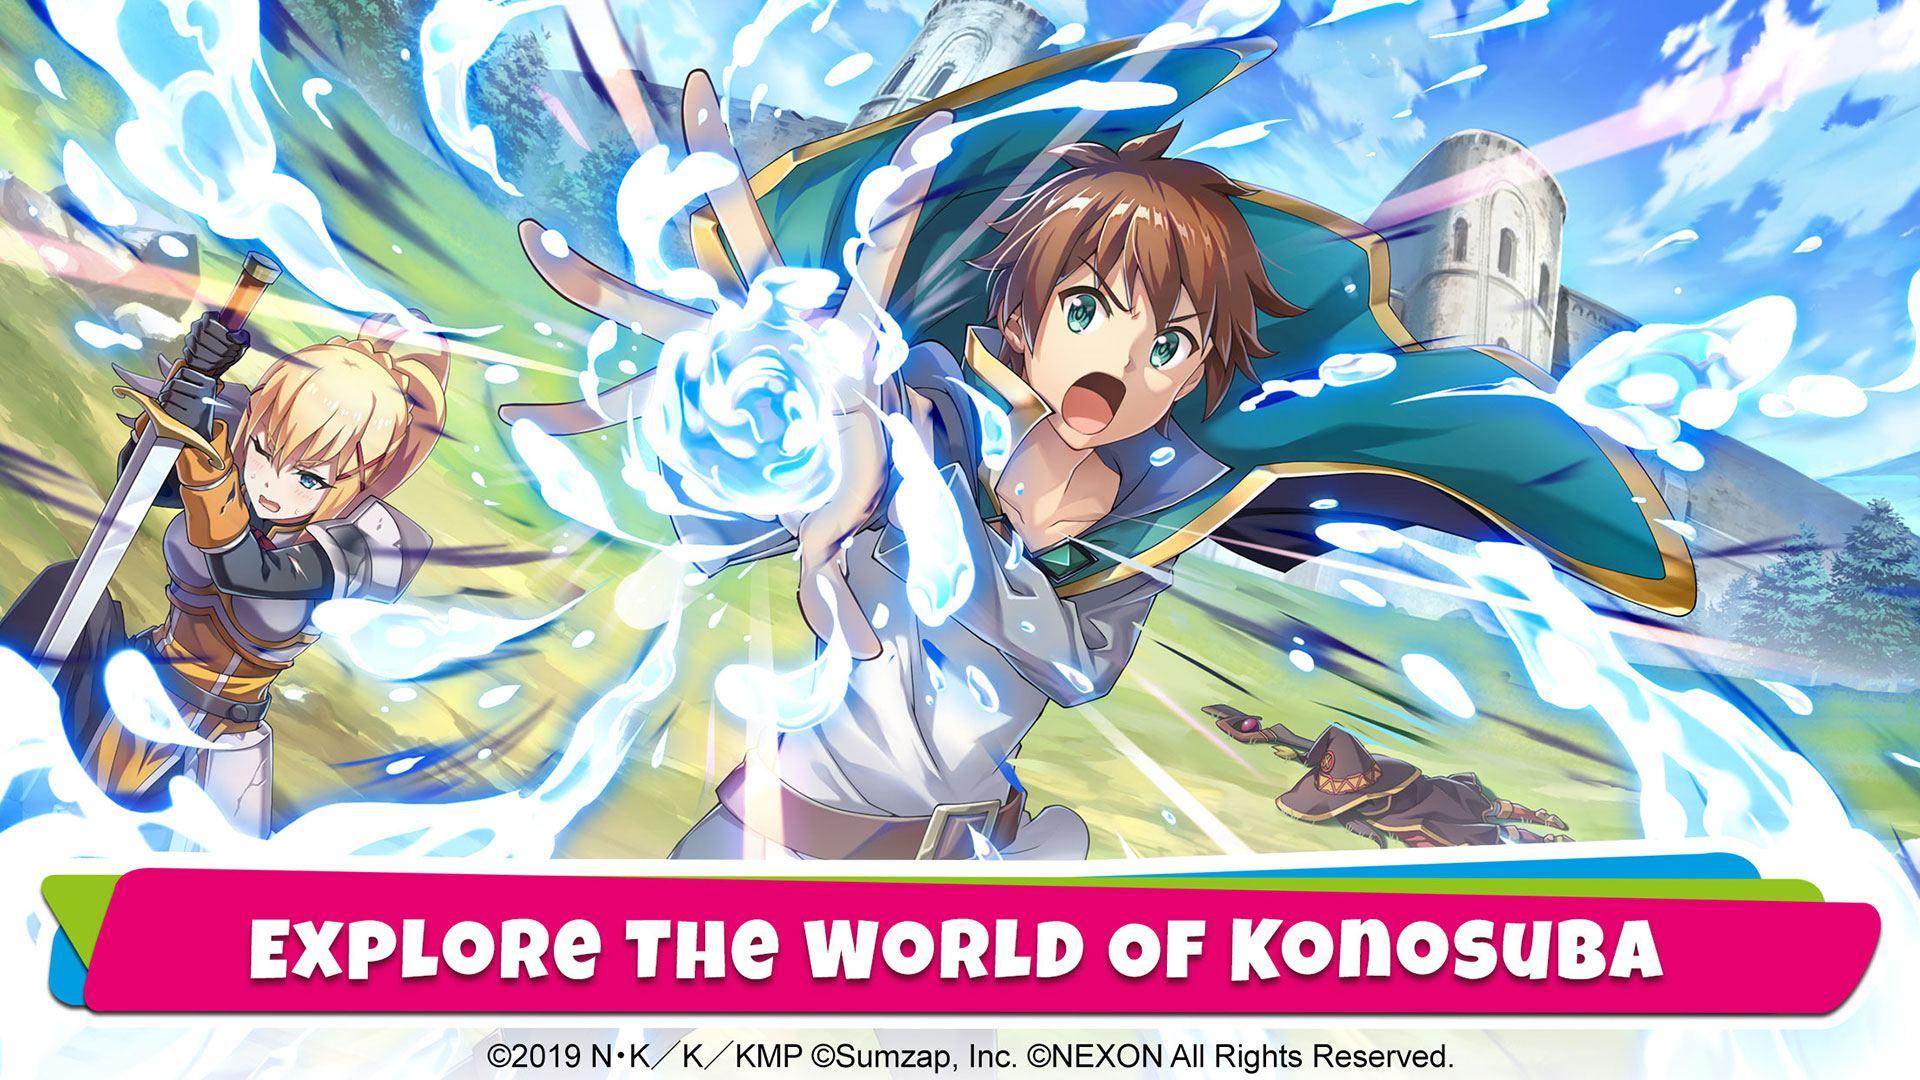 Melihat KonoSuba Fantastic Days yang Siap Dirilis Dalam Waktu Dekat!